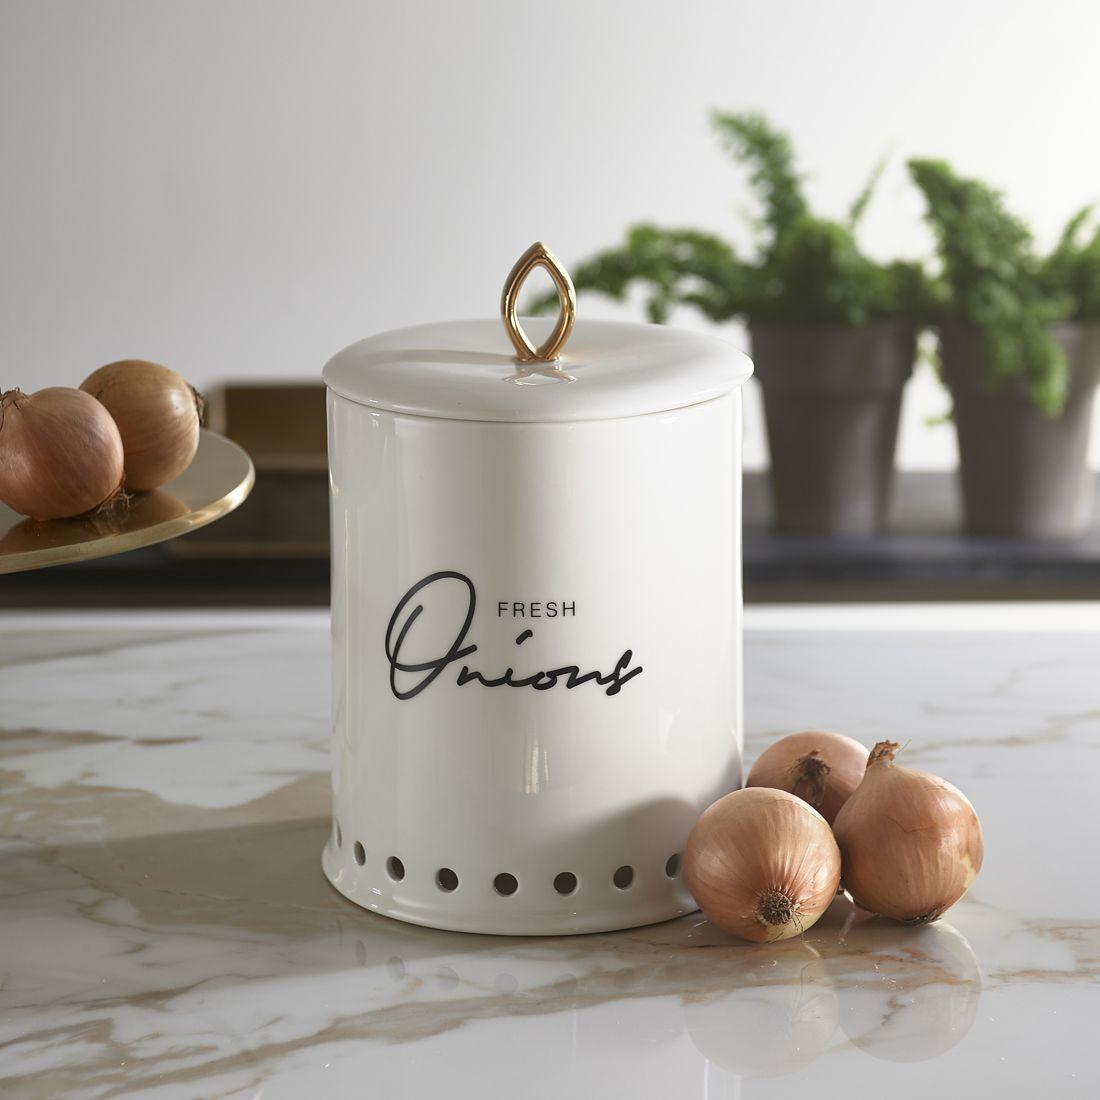 Løgkrukke -Fresh Onions Storage Jar